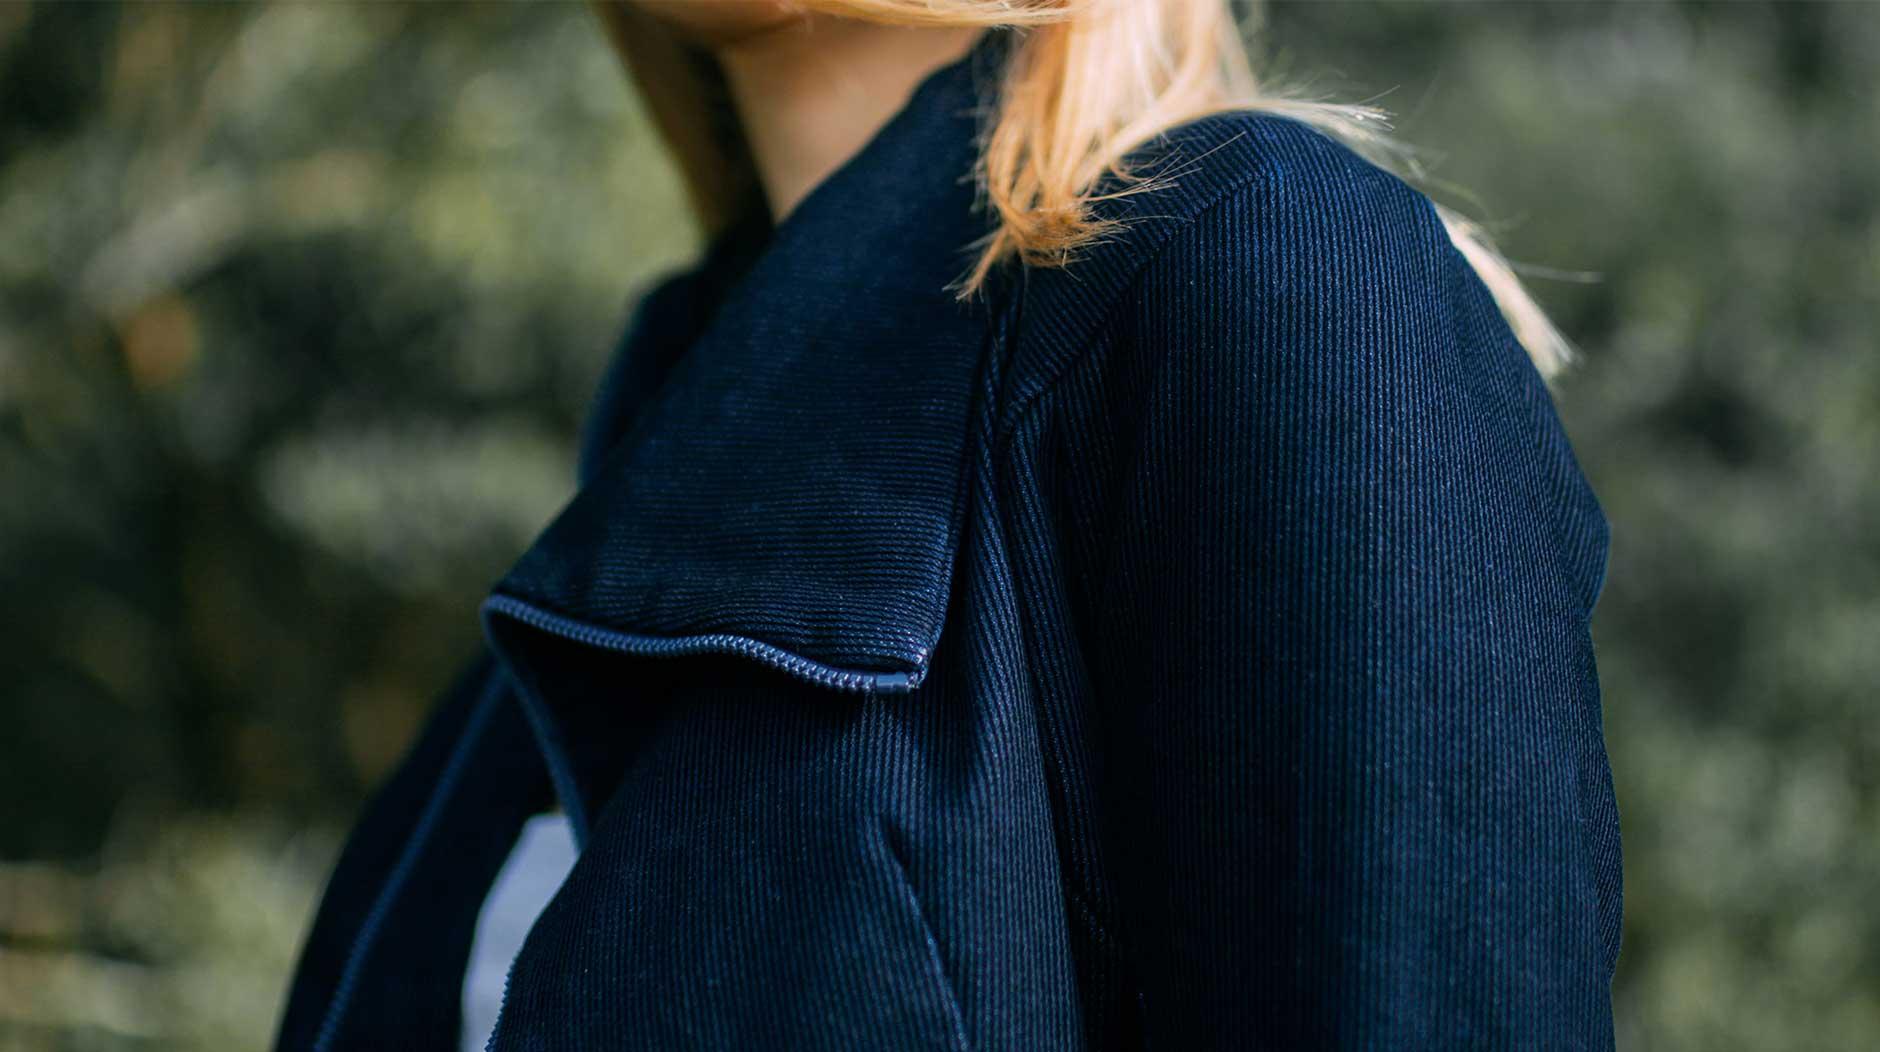 Closeup image of a garment's fabric